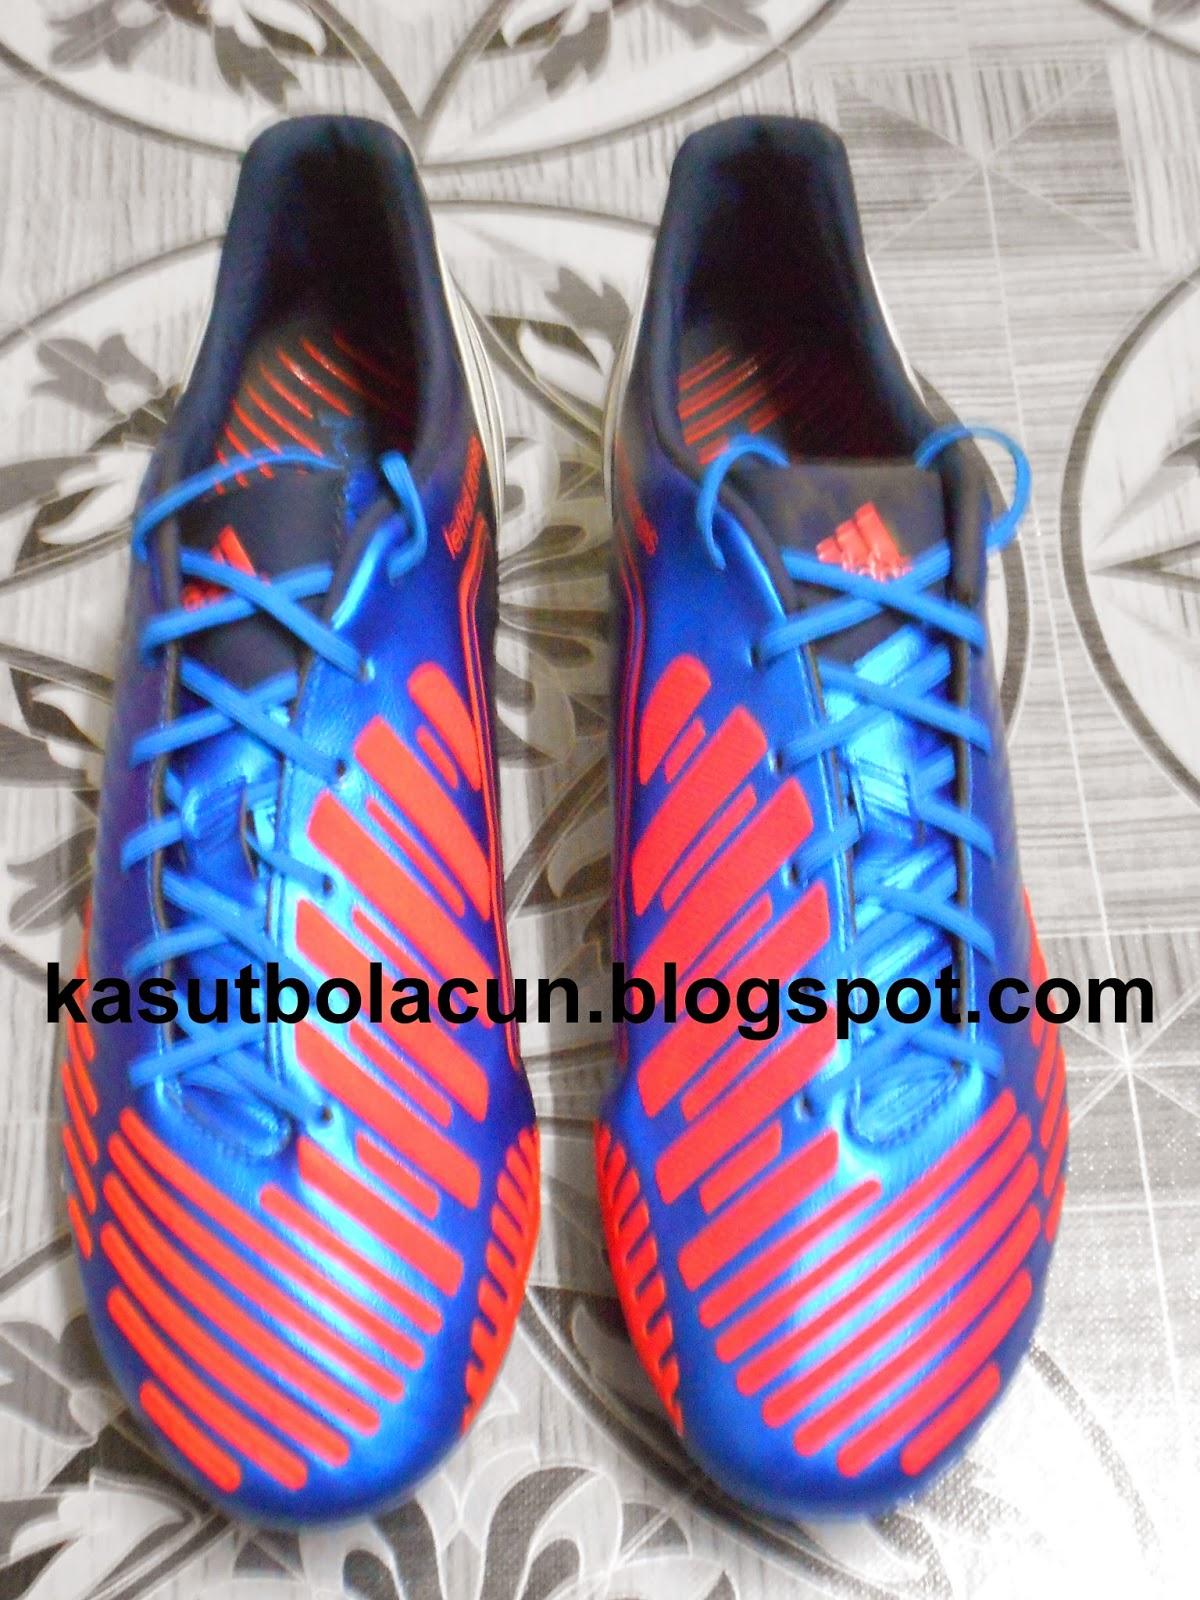 http://kasutbolacun.blogspot.com/2015/03/adidas-predator-lz-1-sg.html